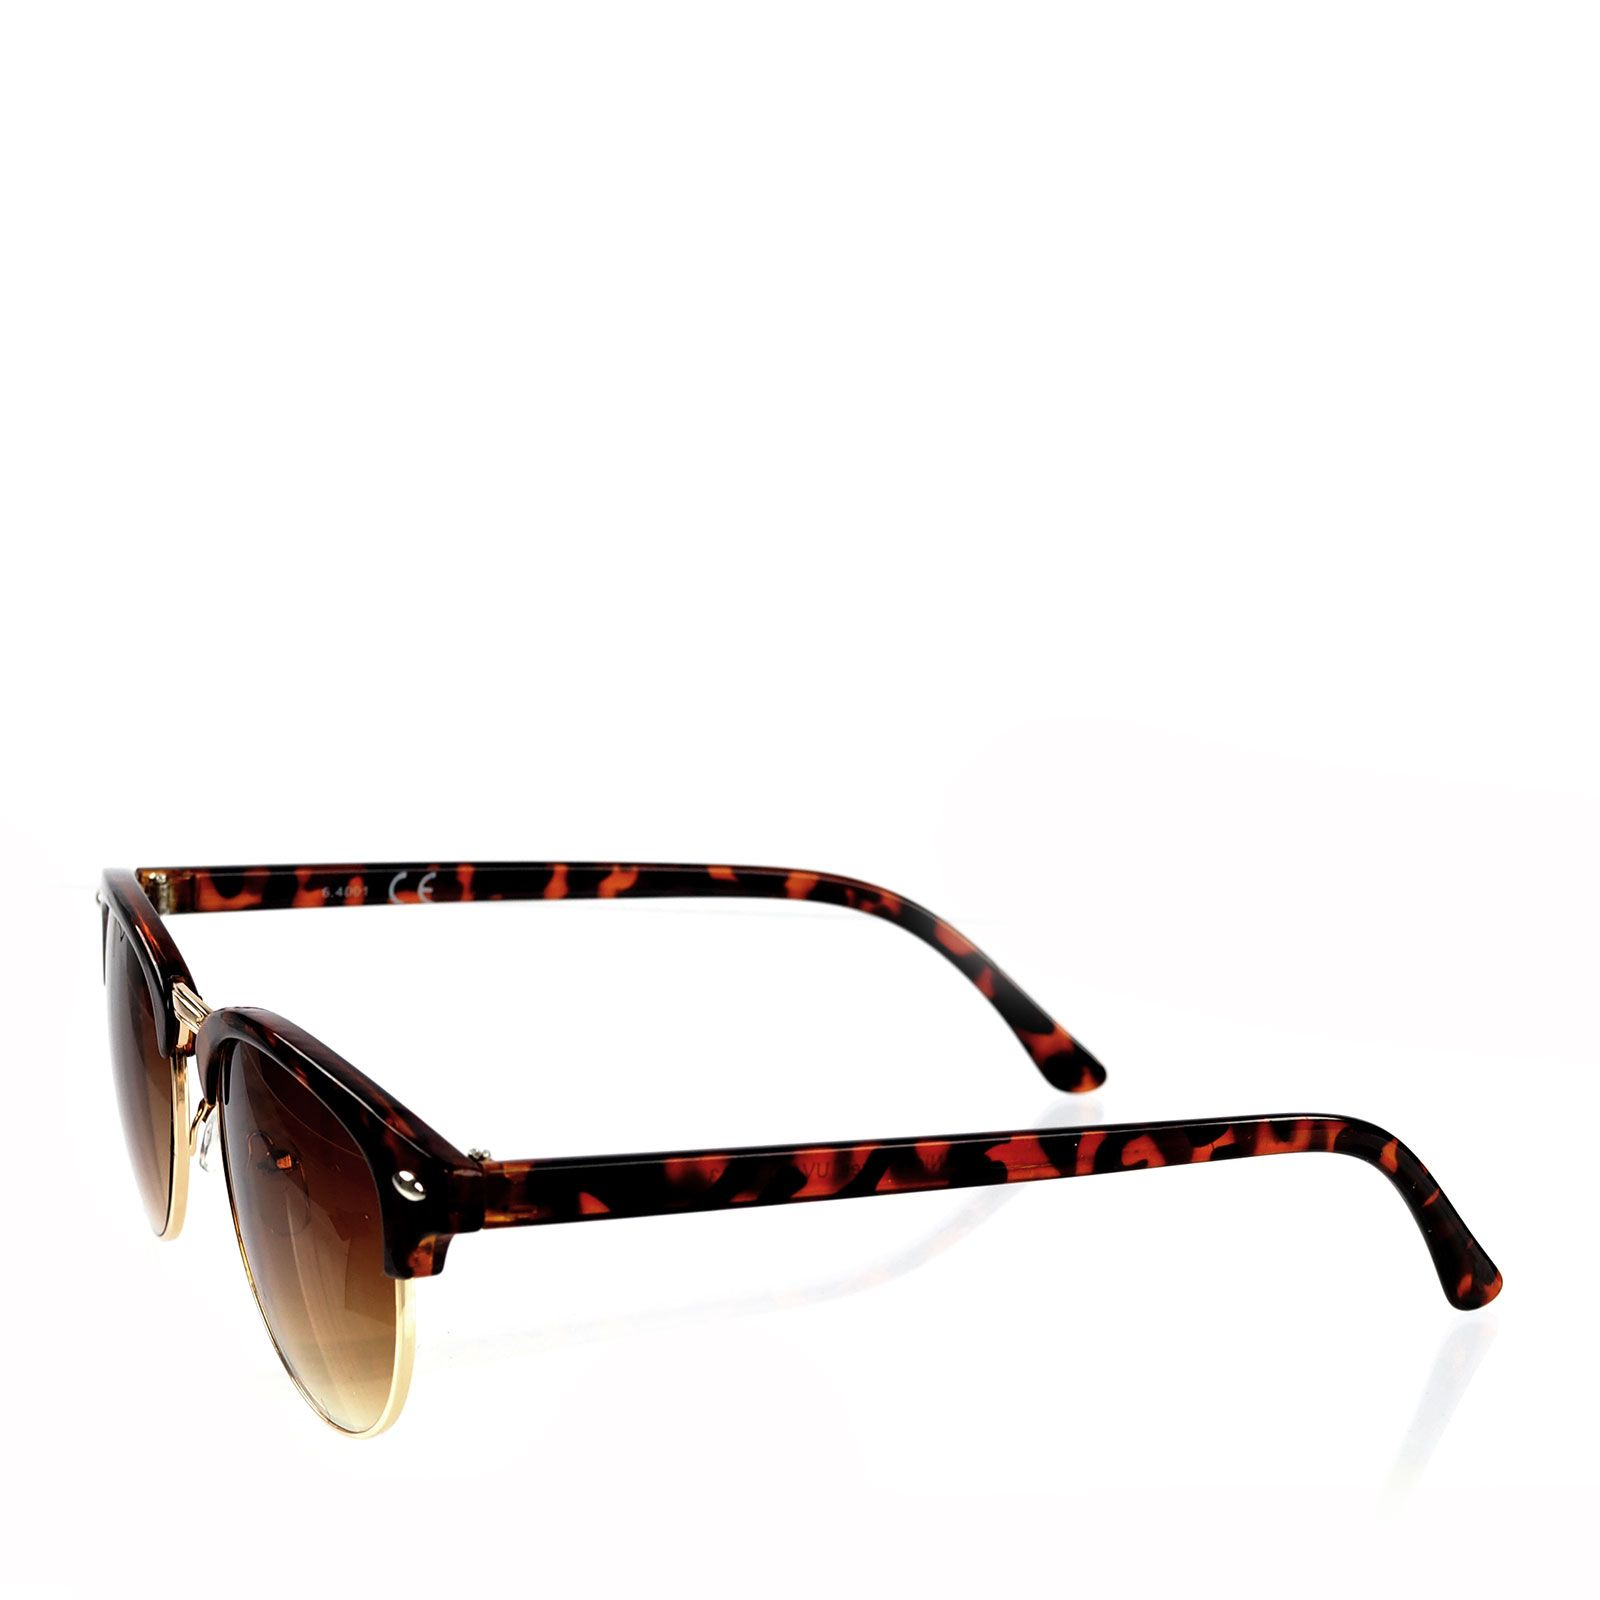 retro zonnebril luipaard accessoires. Black Bedroom Furniture Sets. Home Design Ideas